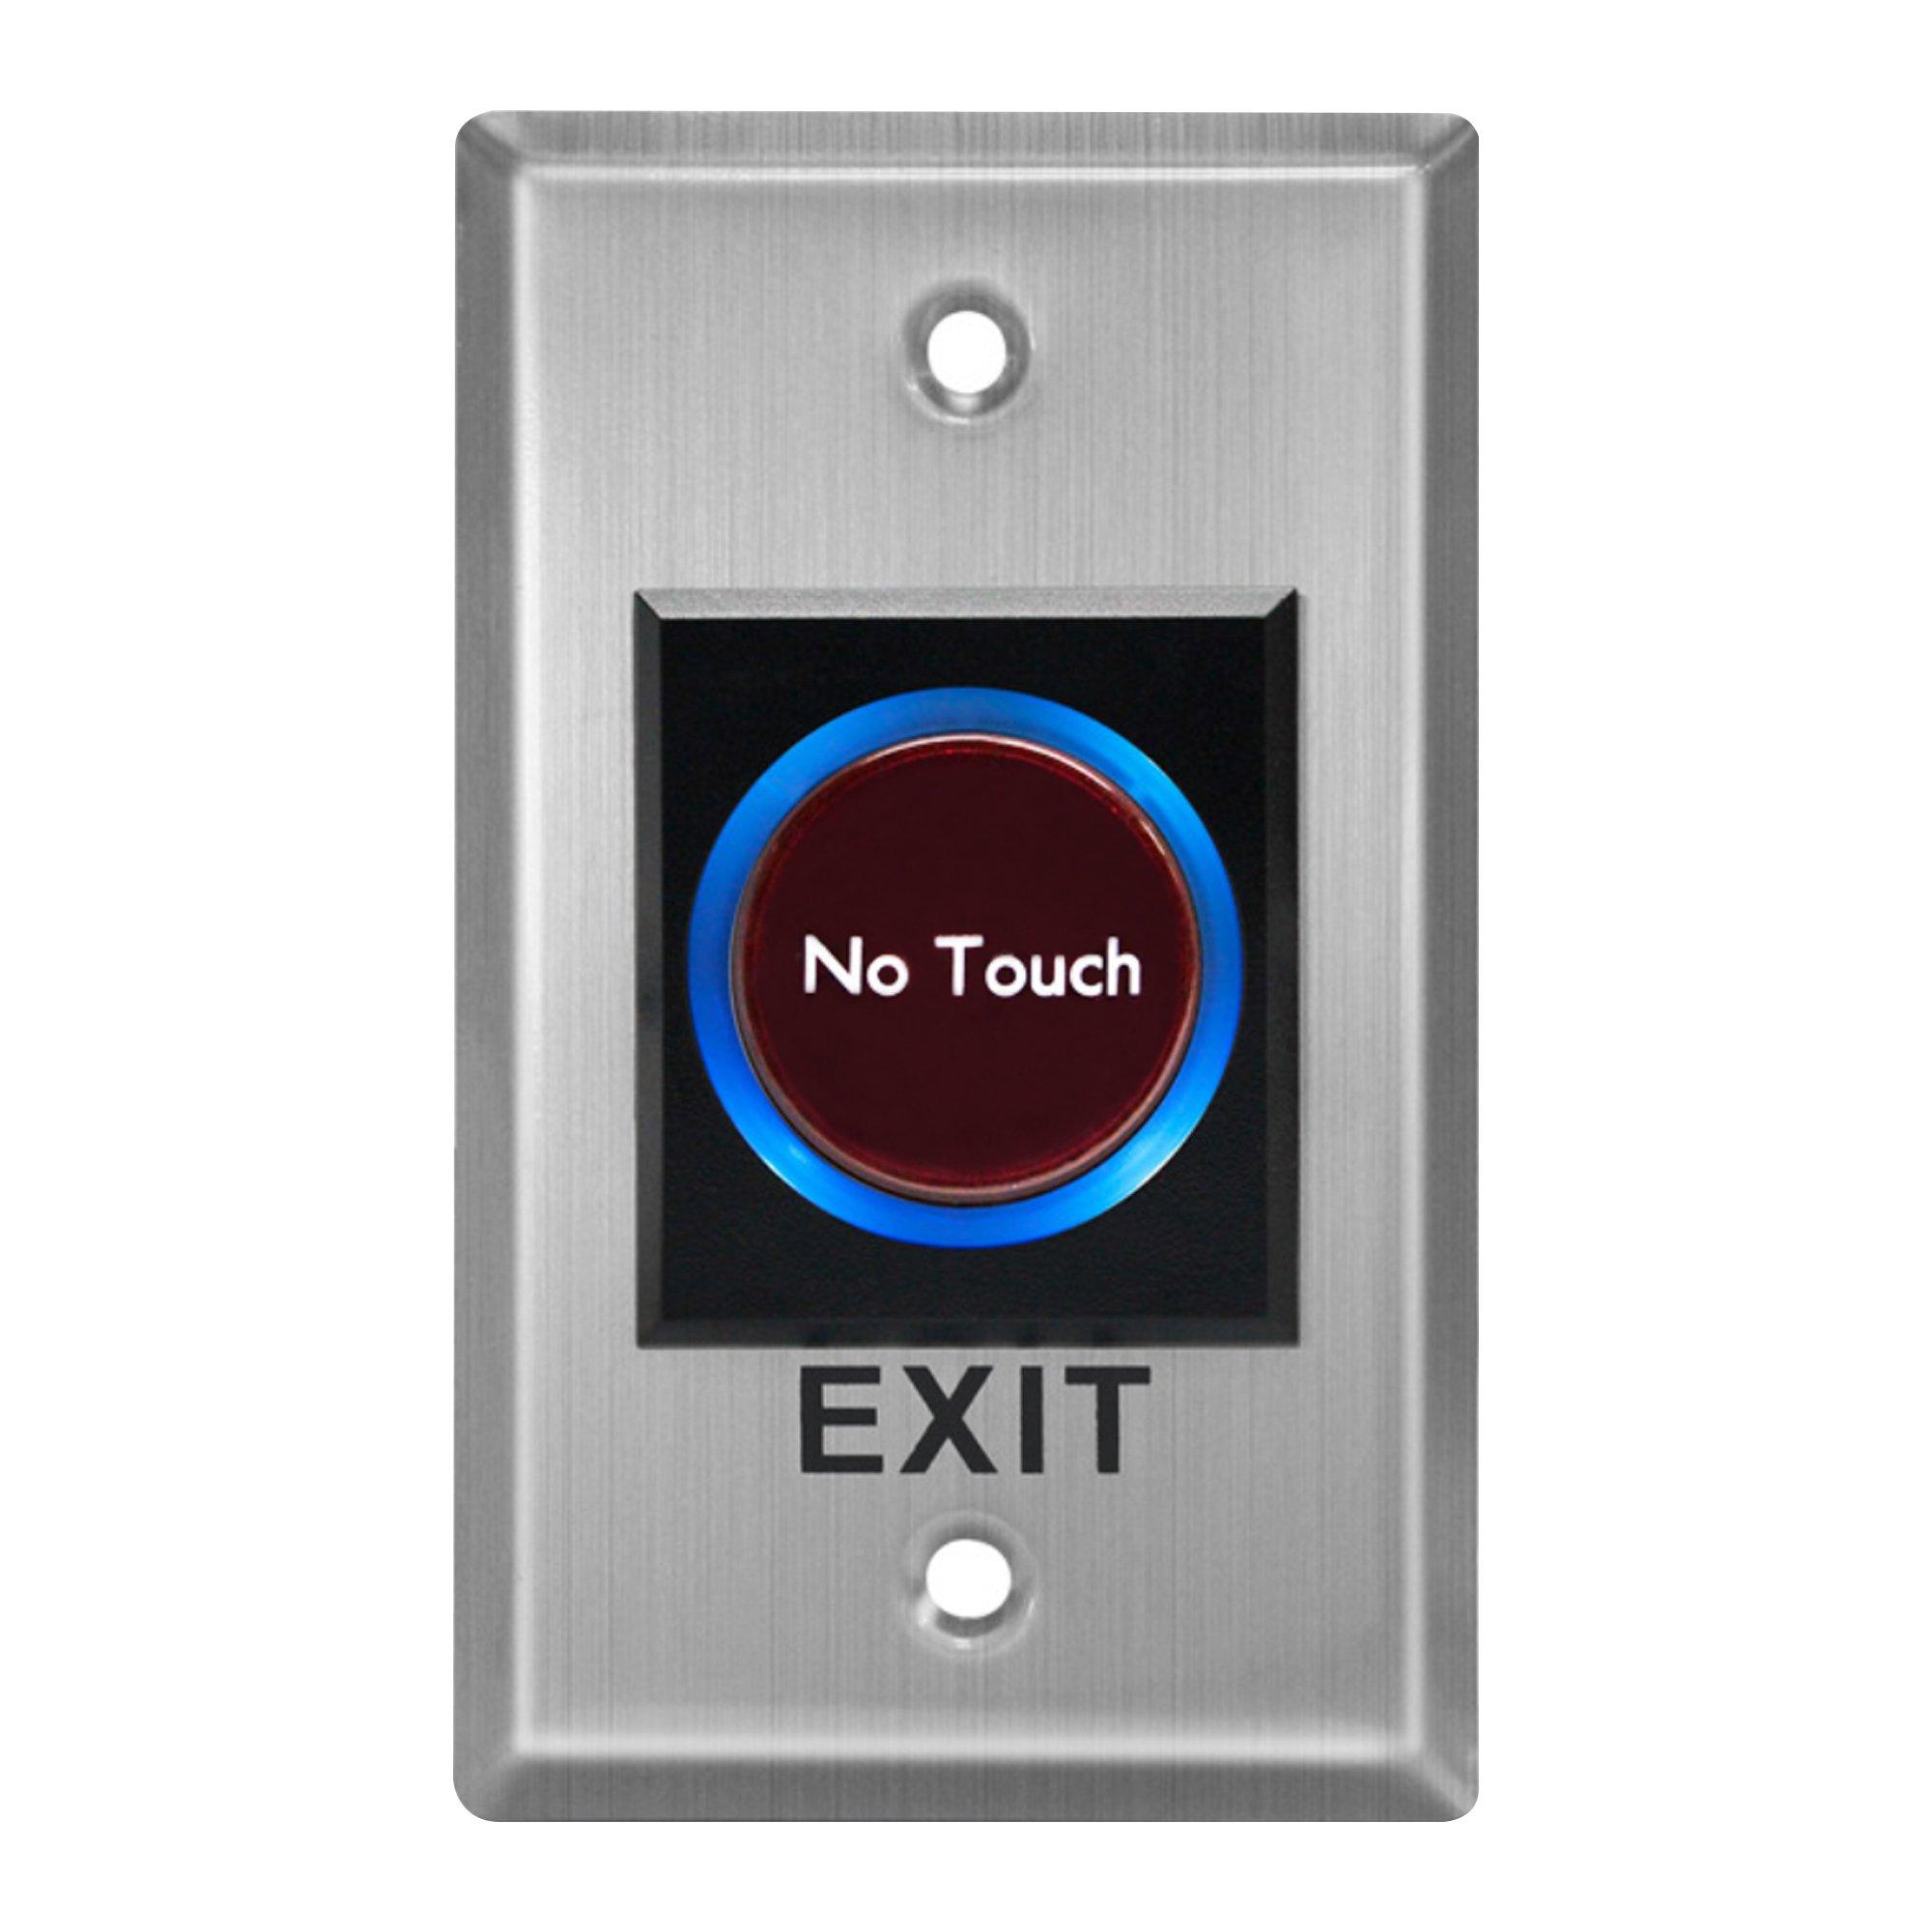 Contactless Infrared Sensor Door Exit Button